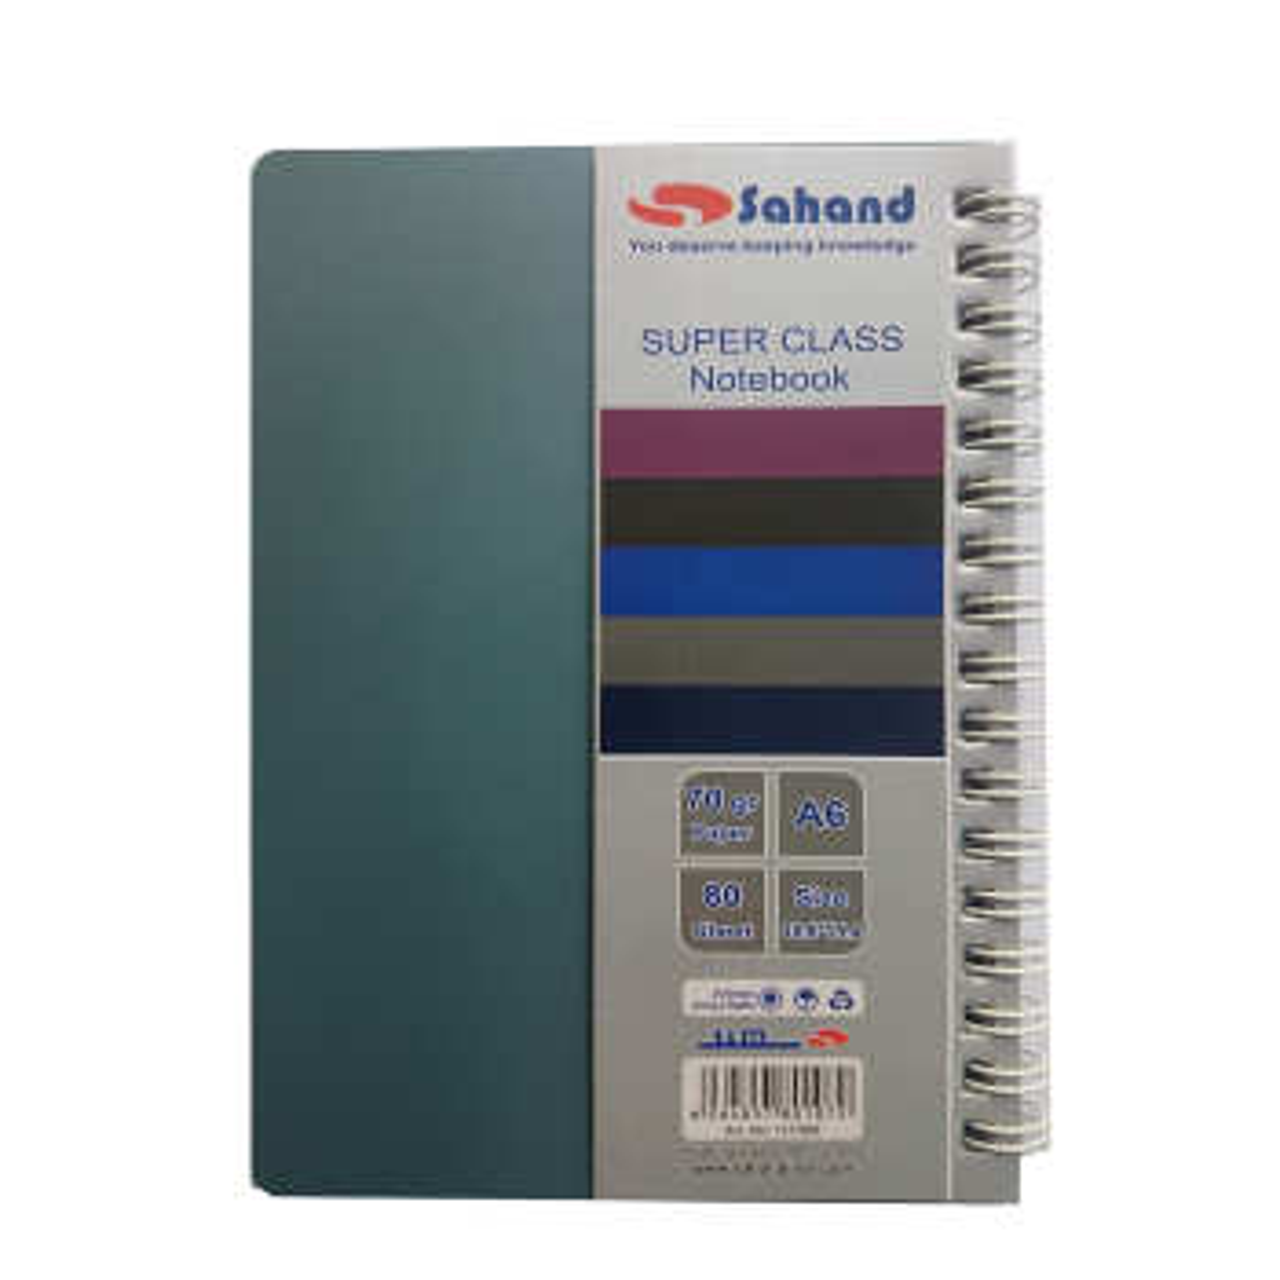 دفترچه یادداشت سوپر کلاس سهند کد7412